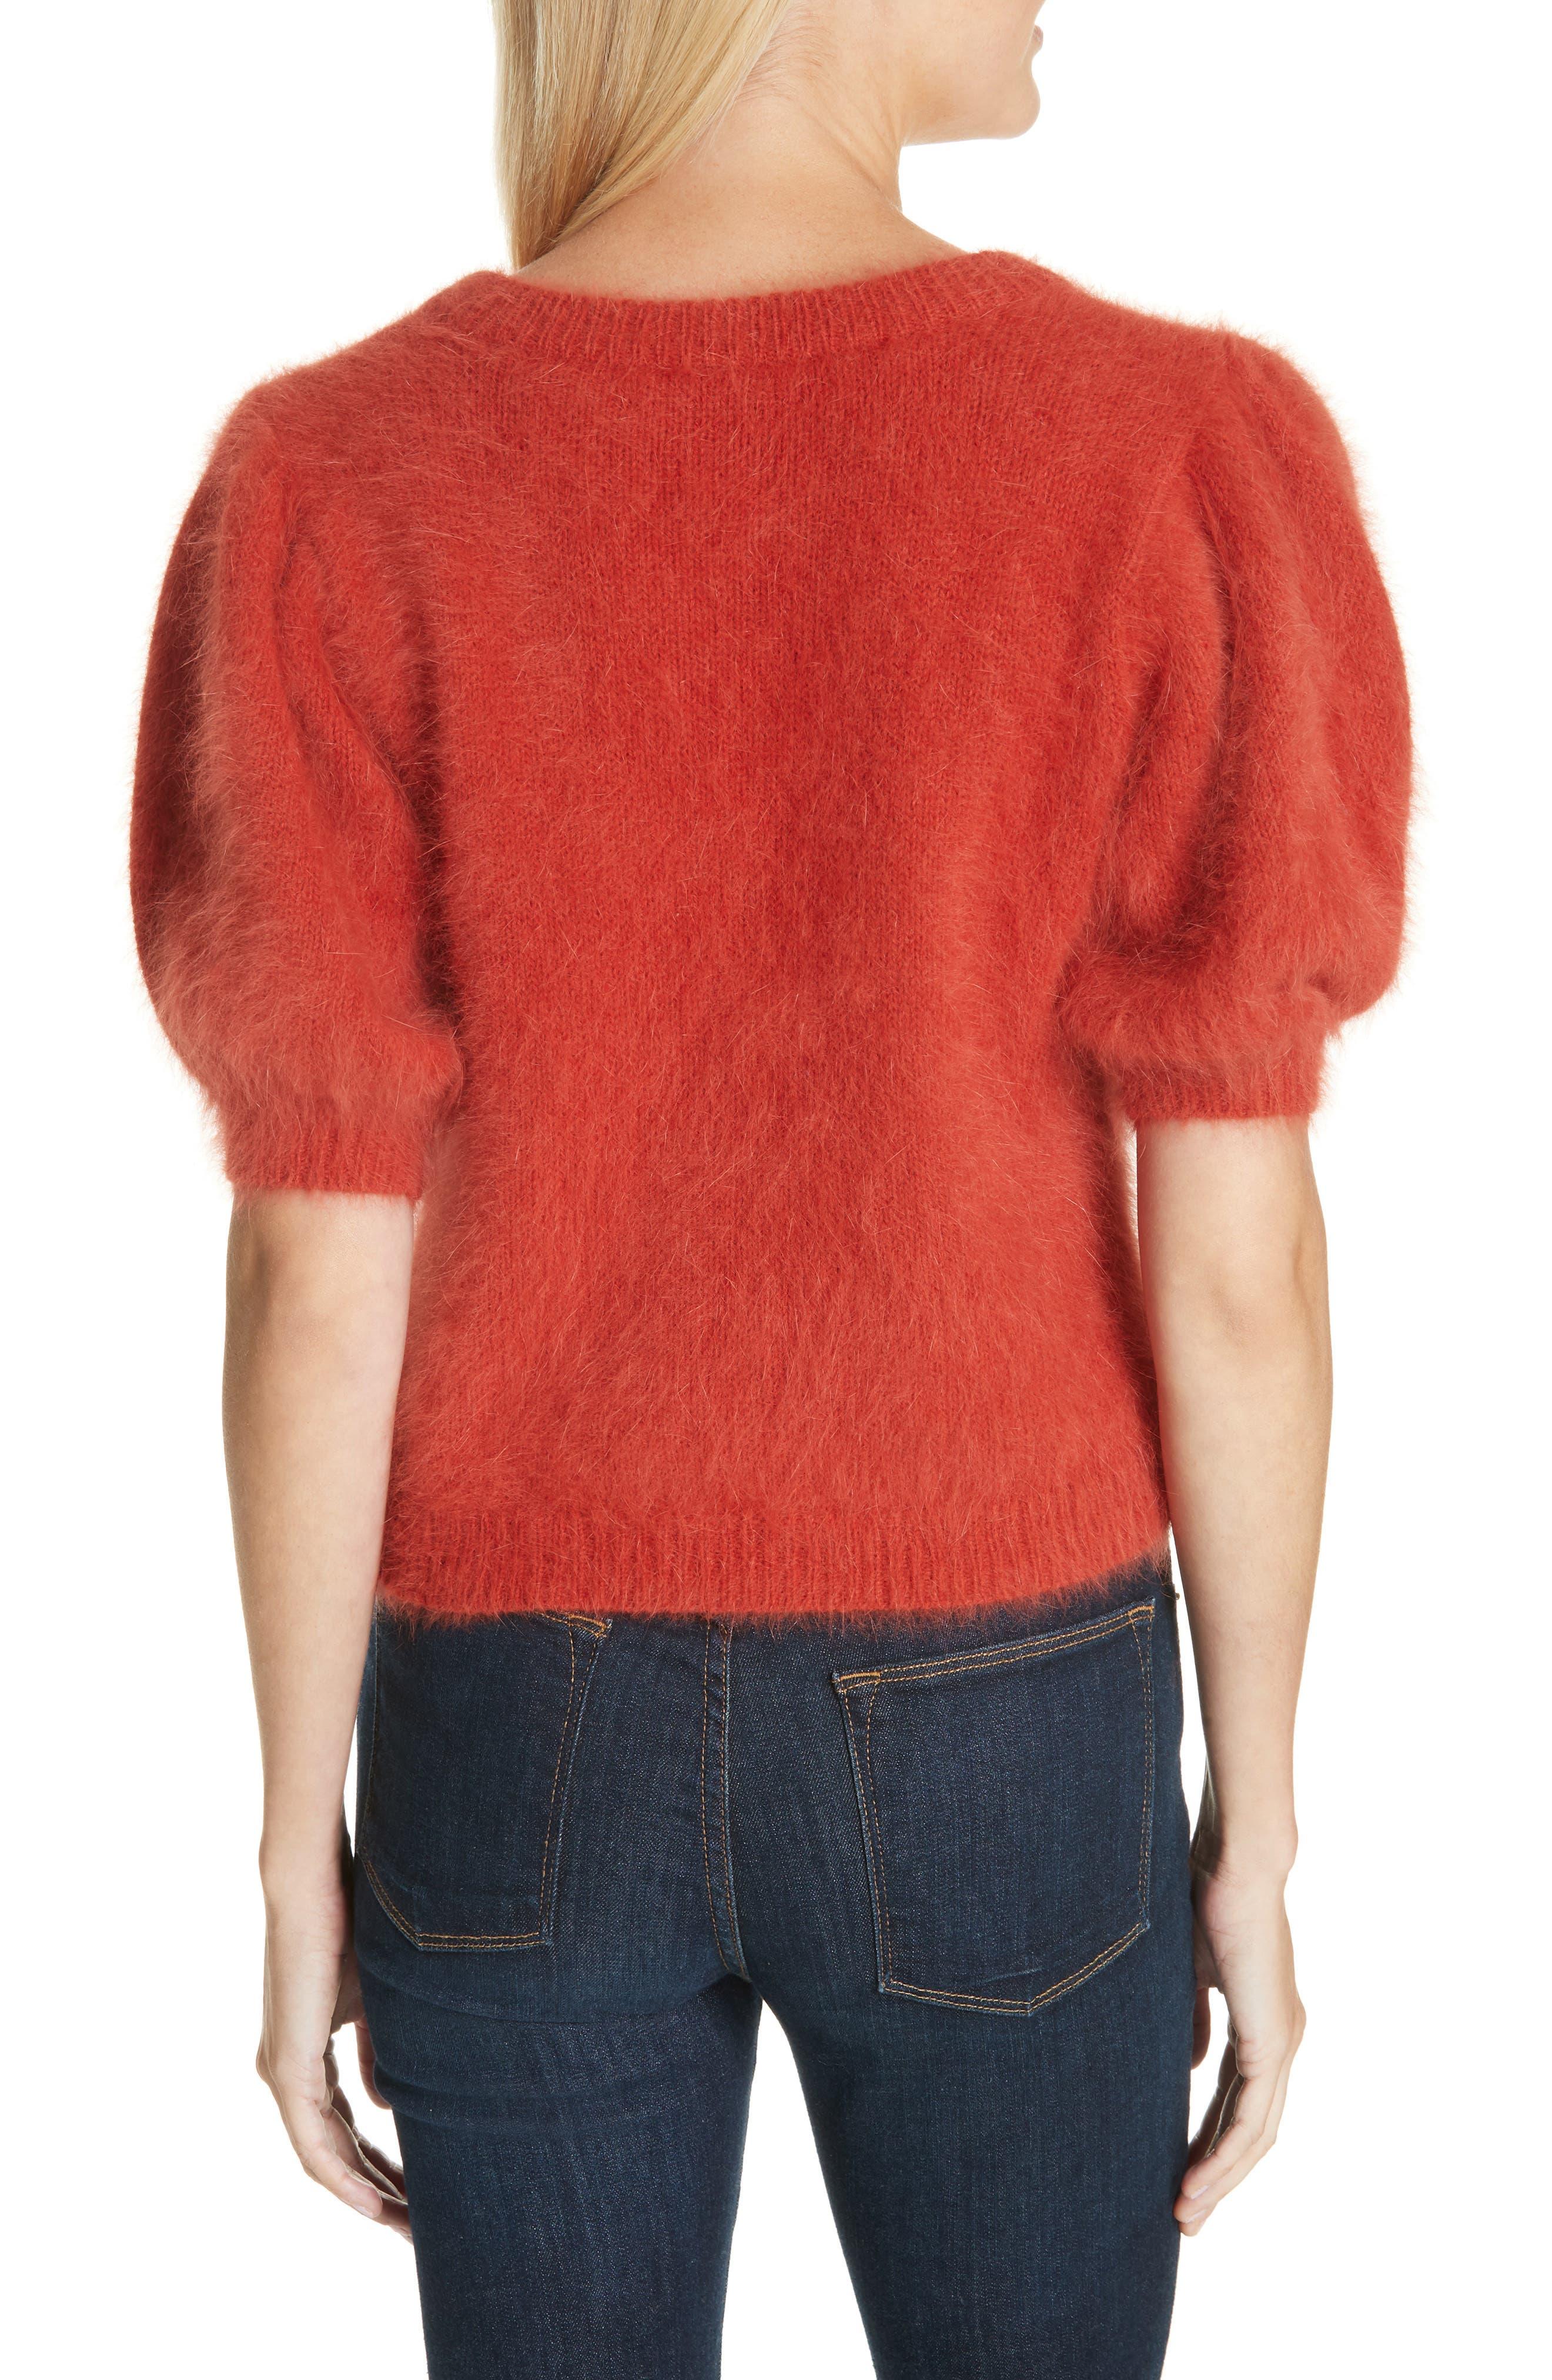 ULLA JOHNSON,                             Aries Puff Sleeve Sweater,                             Alternate thumbnail 2, color,                             600